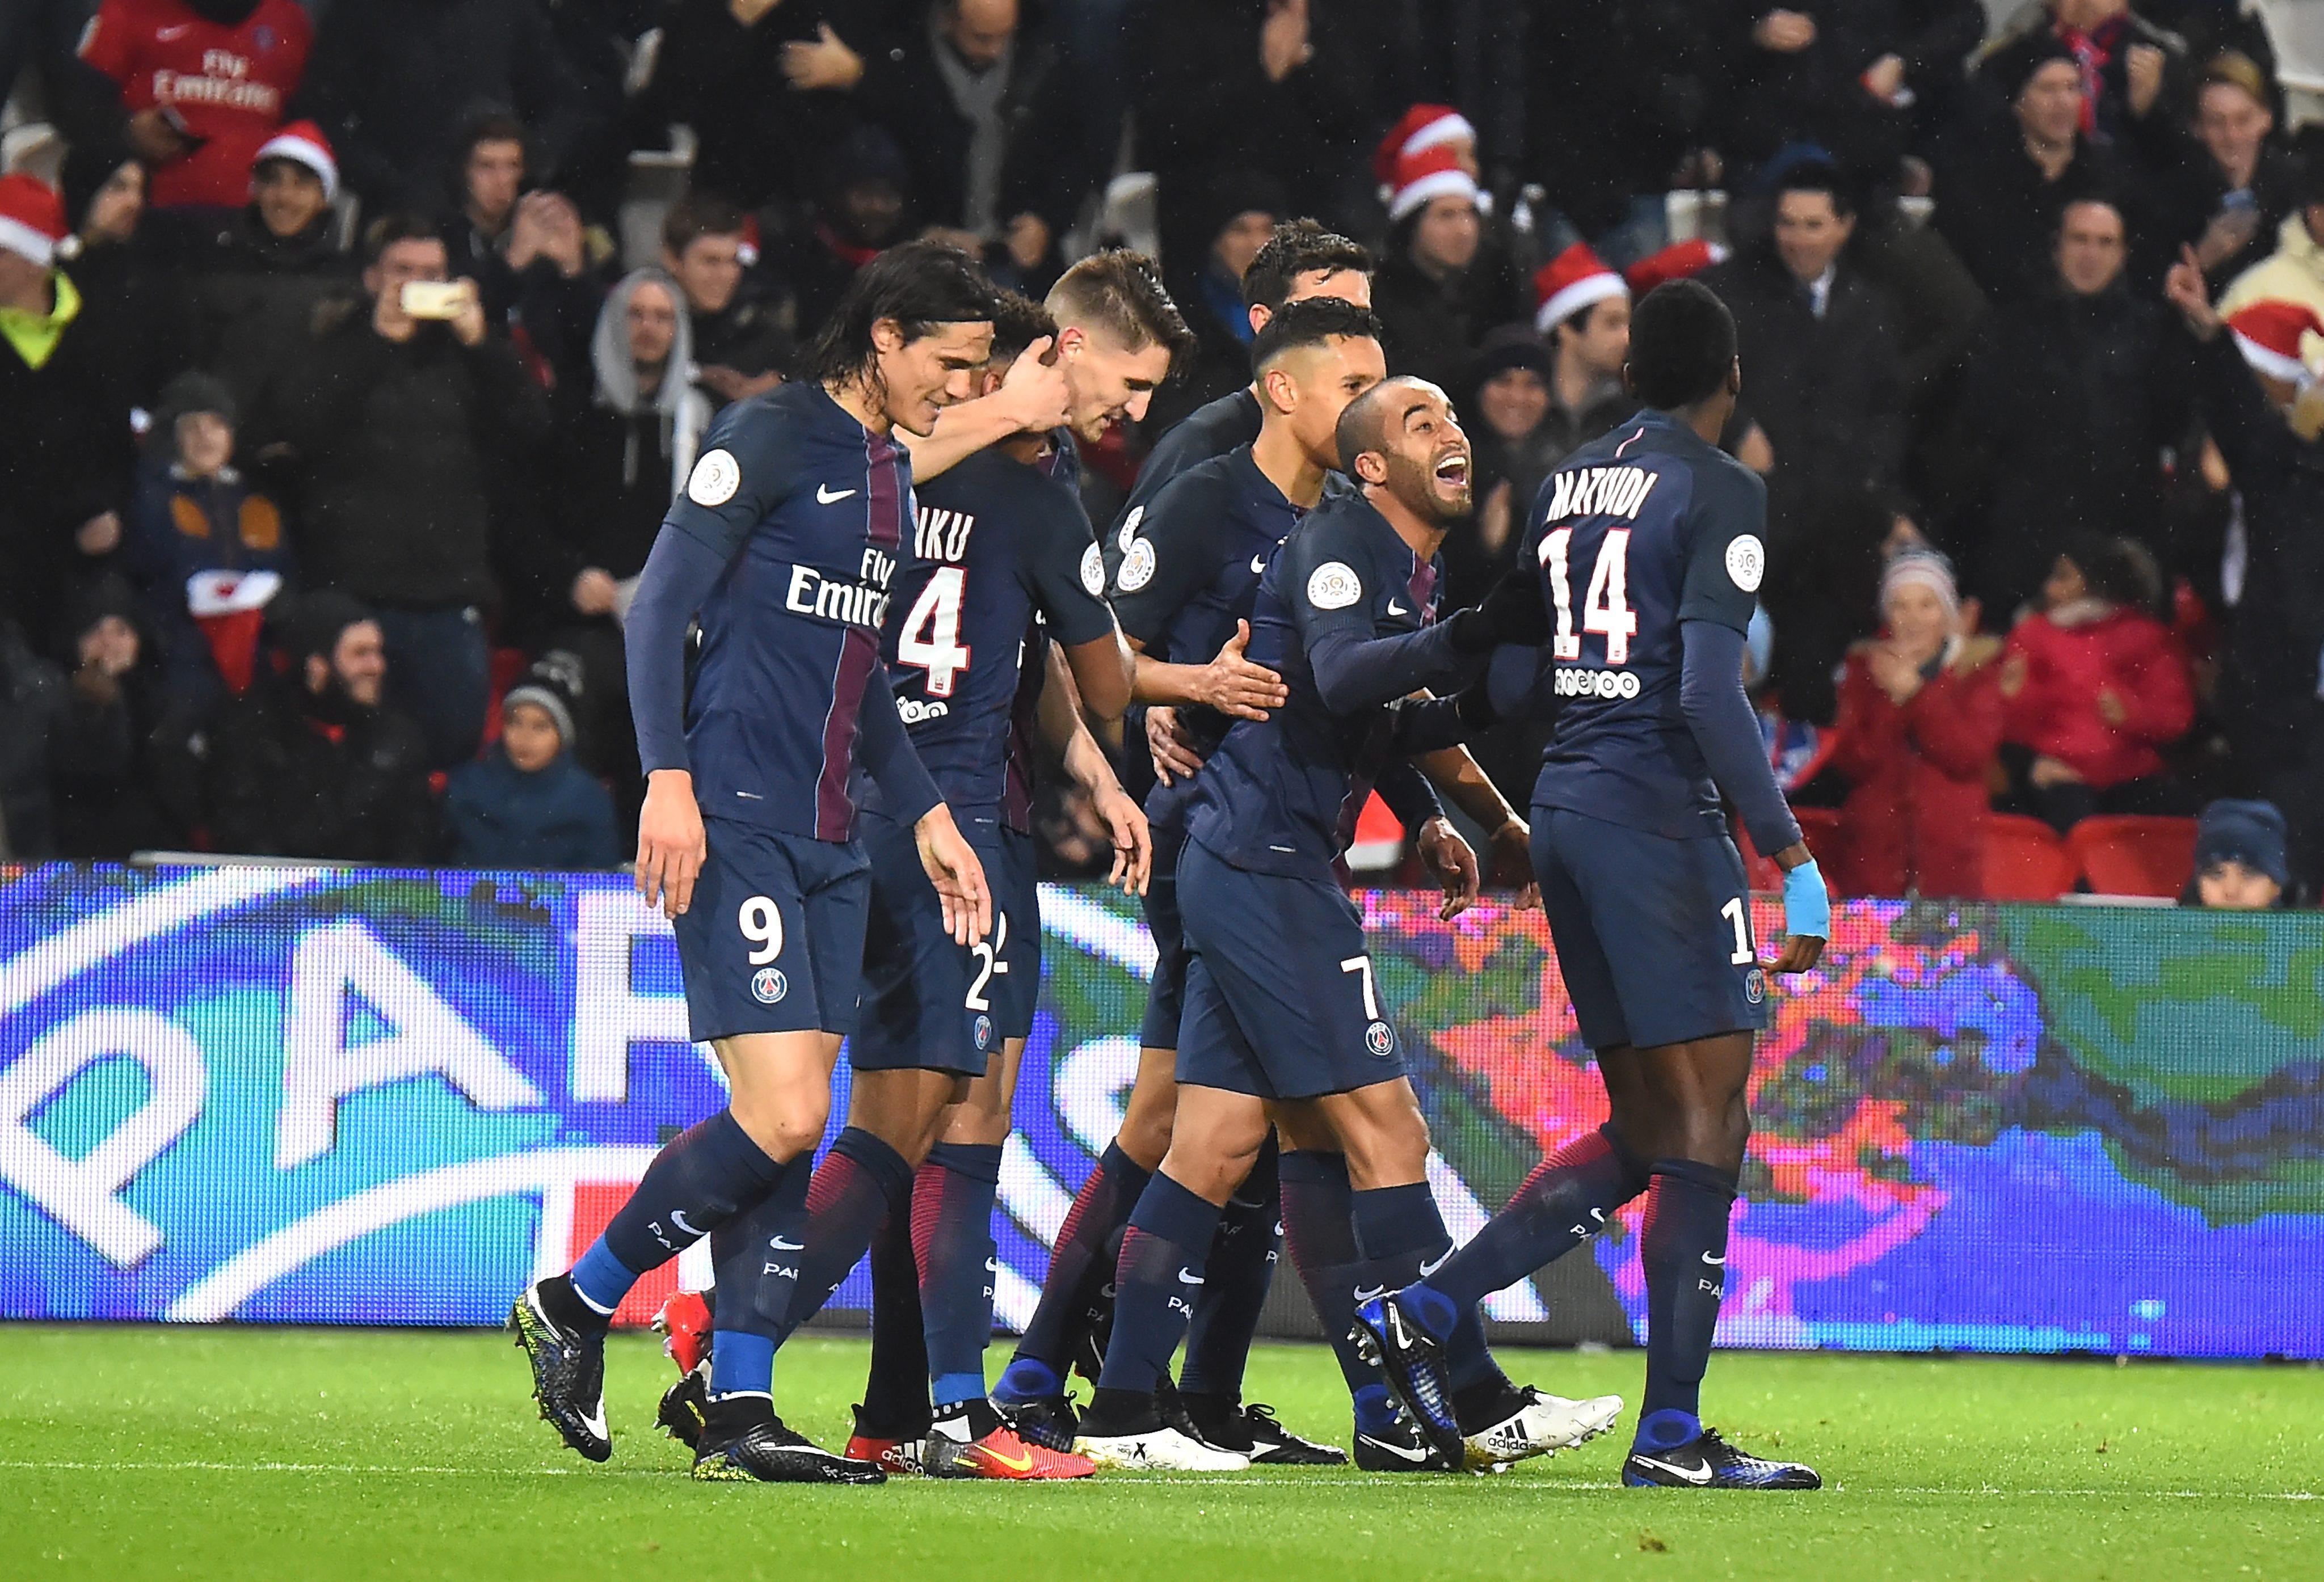 30aba06ec Puchar Francji: Rennes - PSG na żywo. Transmisja TV, stream online - WP  SportoweFakty